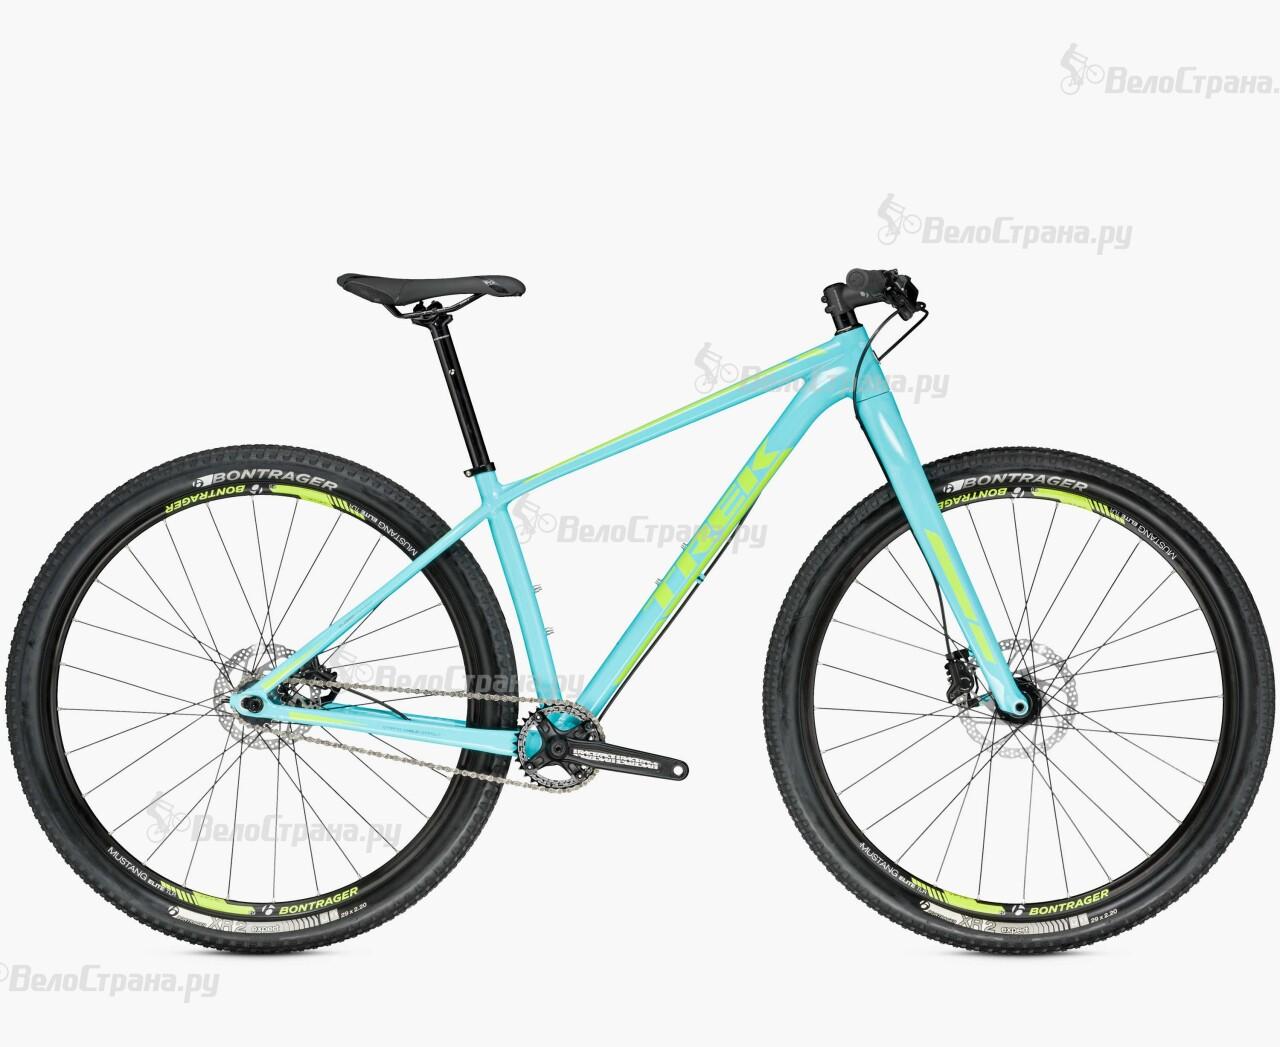 Велосипед Trek Superfly SS (2016) велосипед trek superfly al 2013